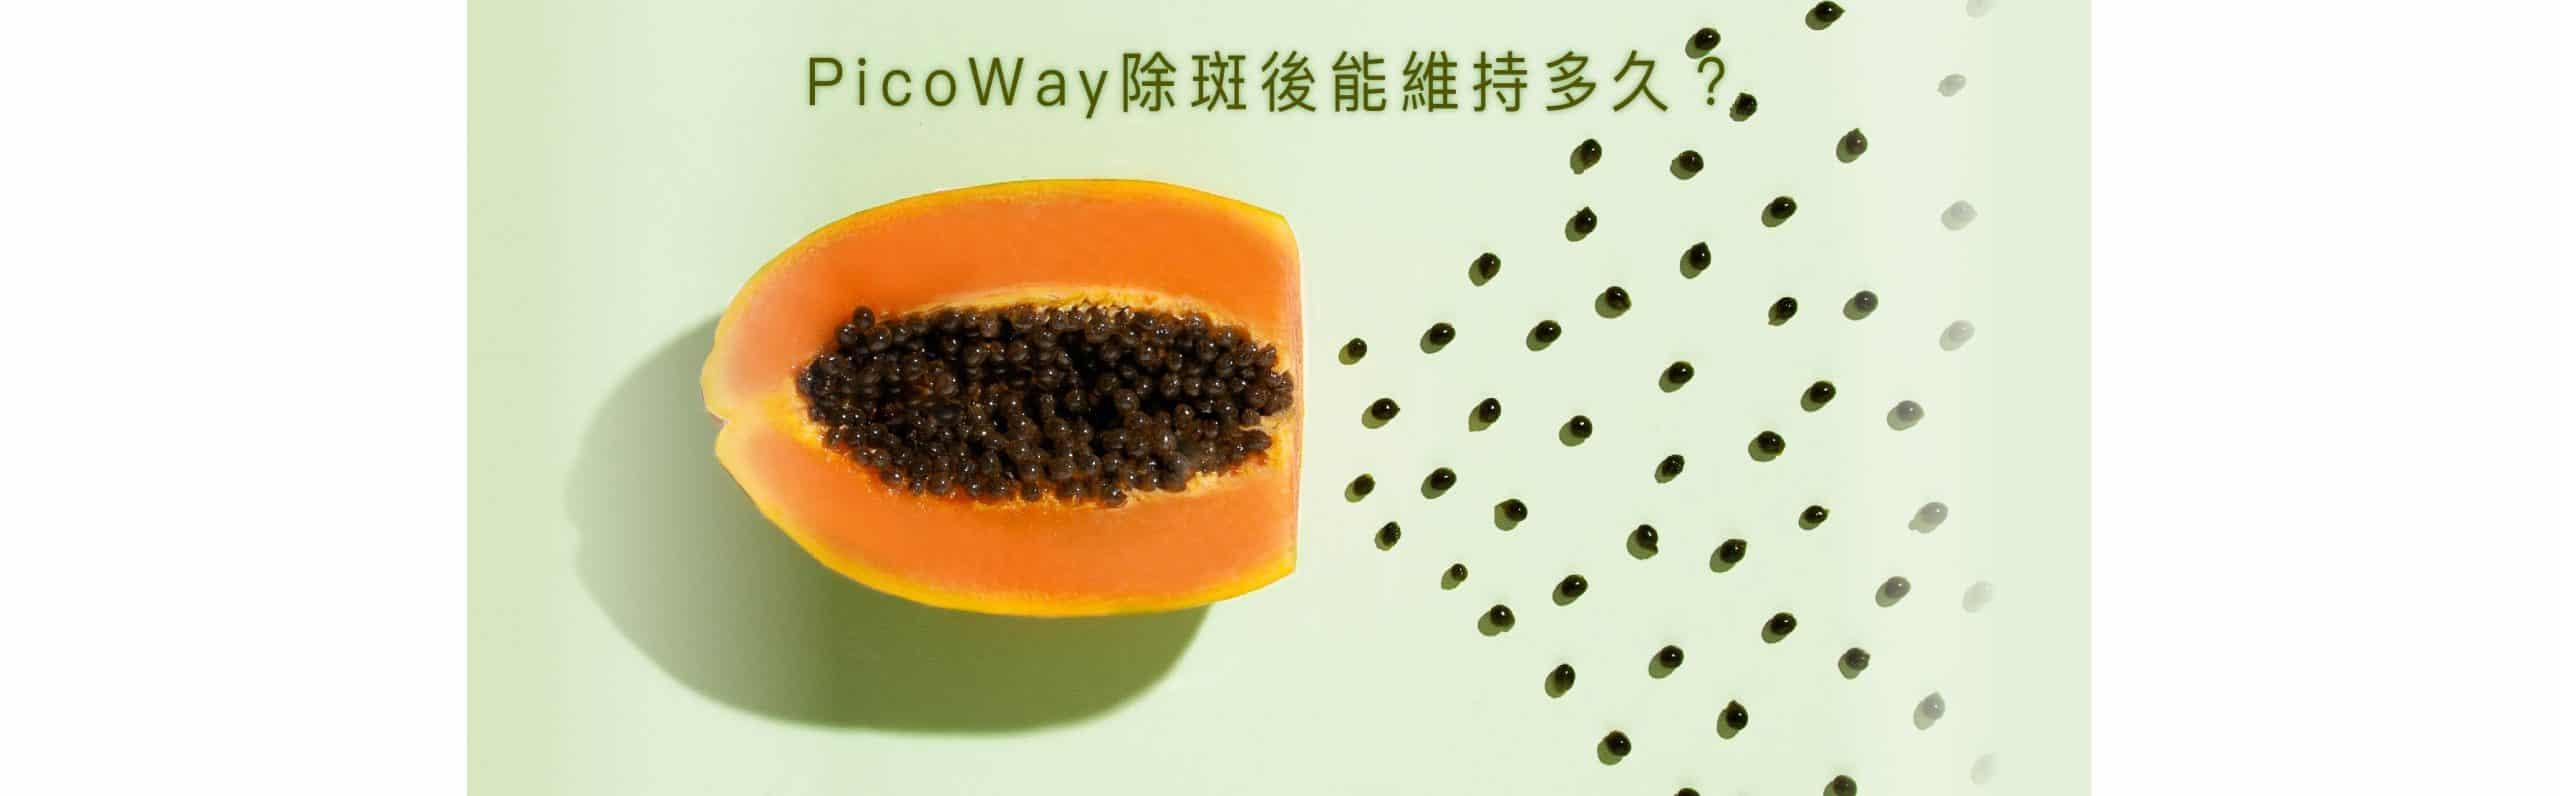 Picoway Picoway ptop3 33 1 scaled